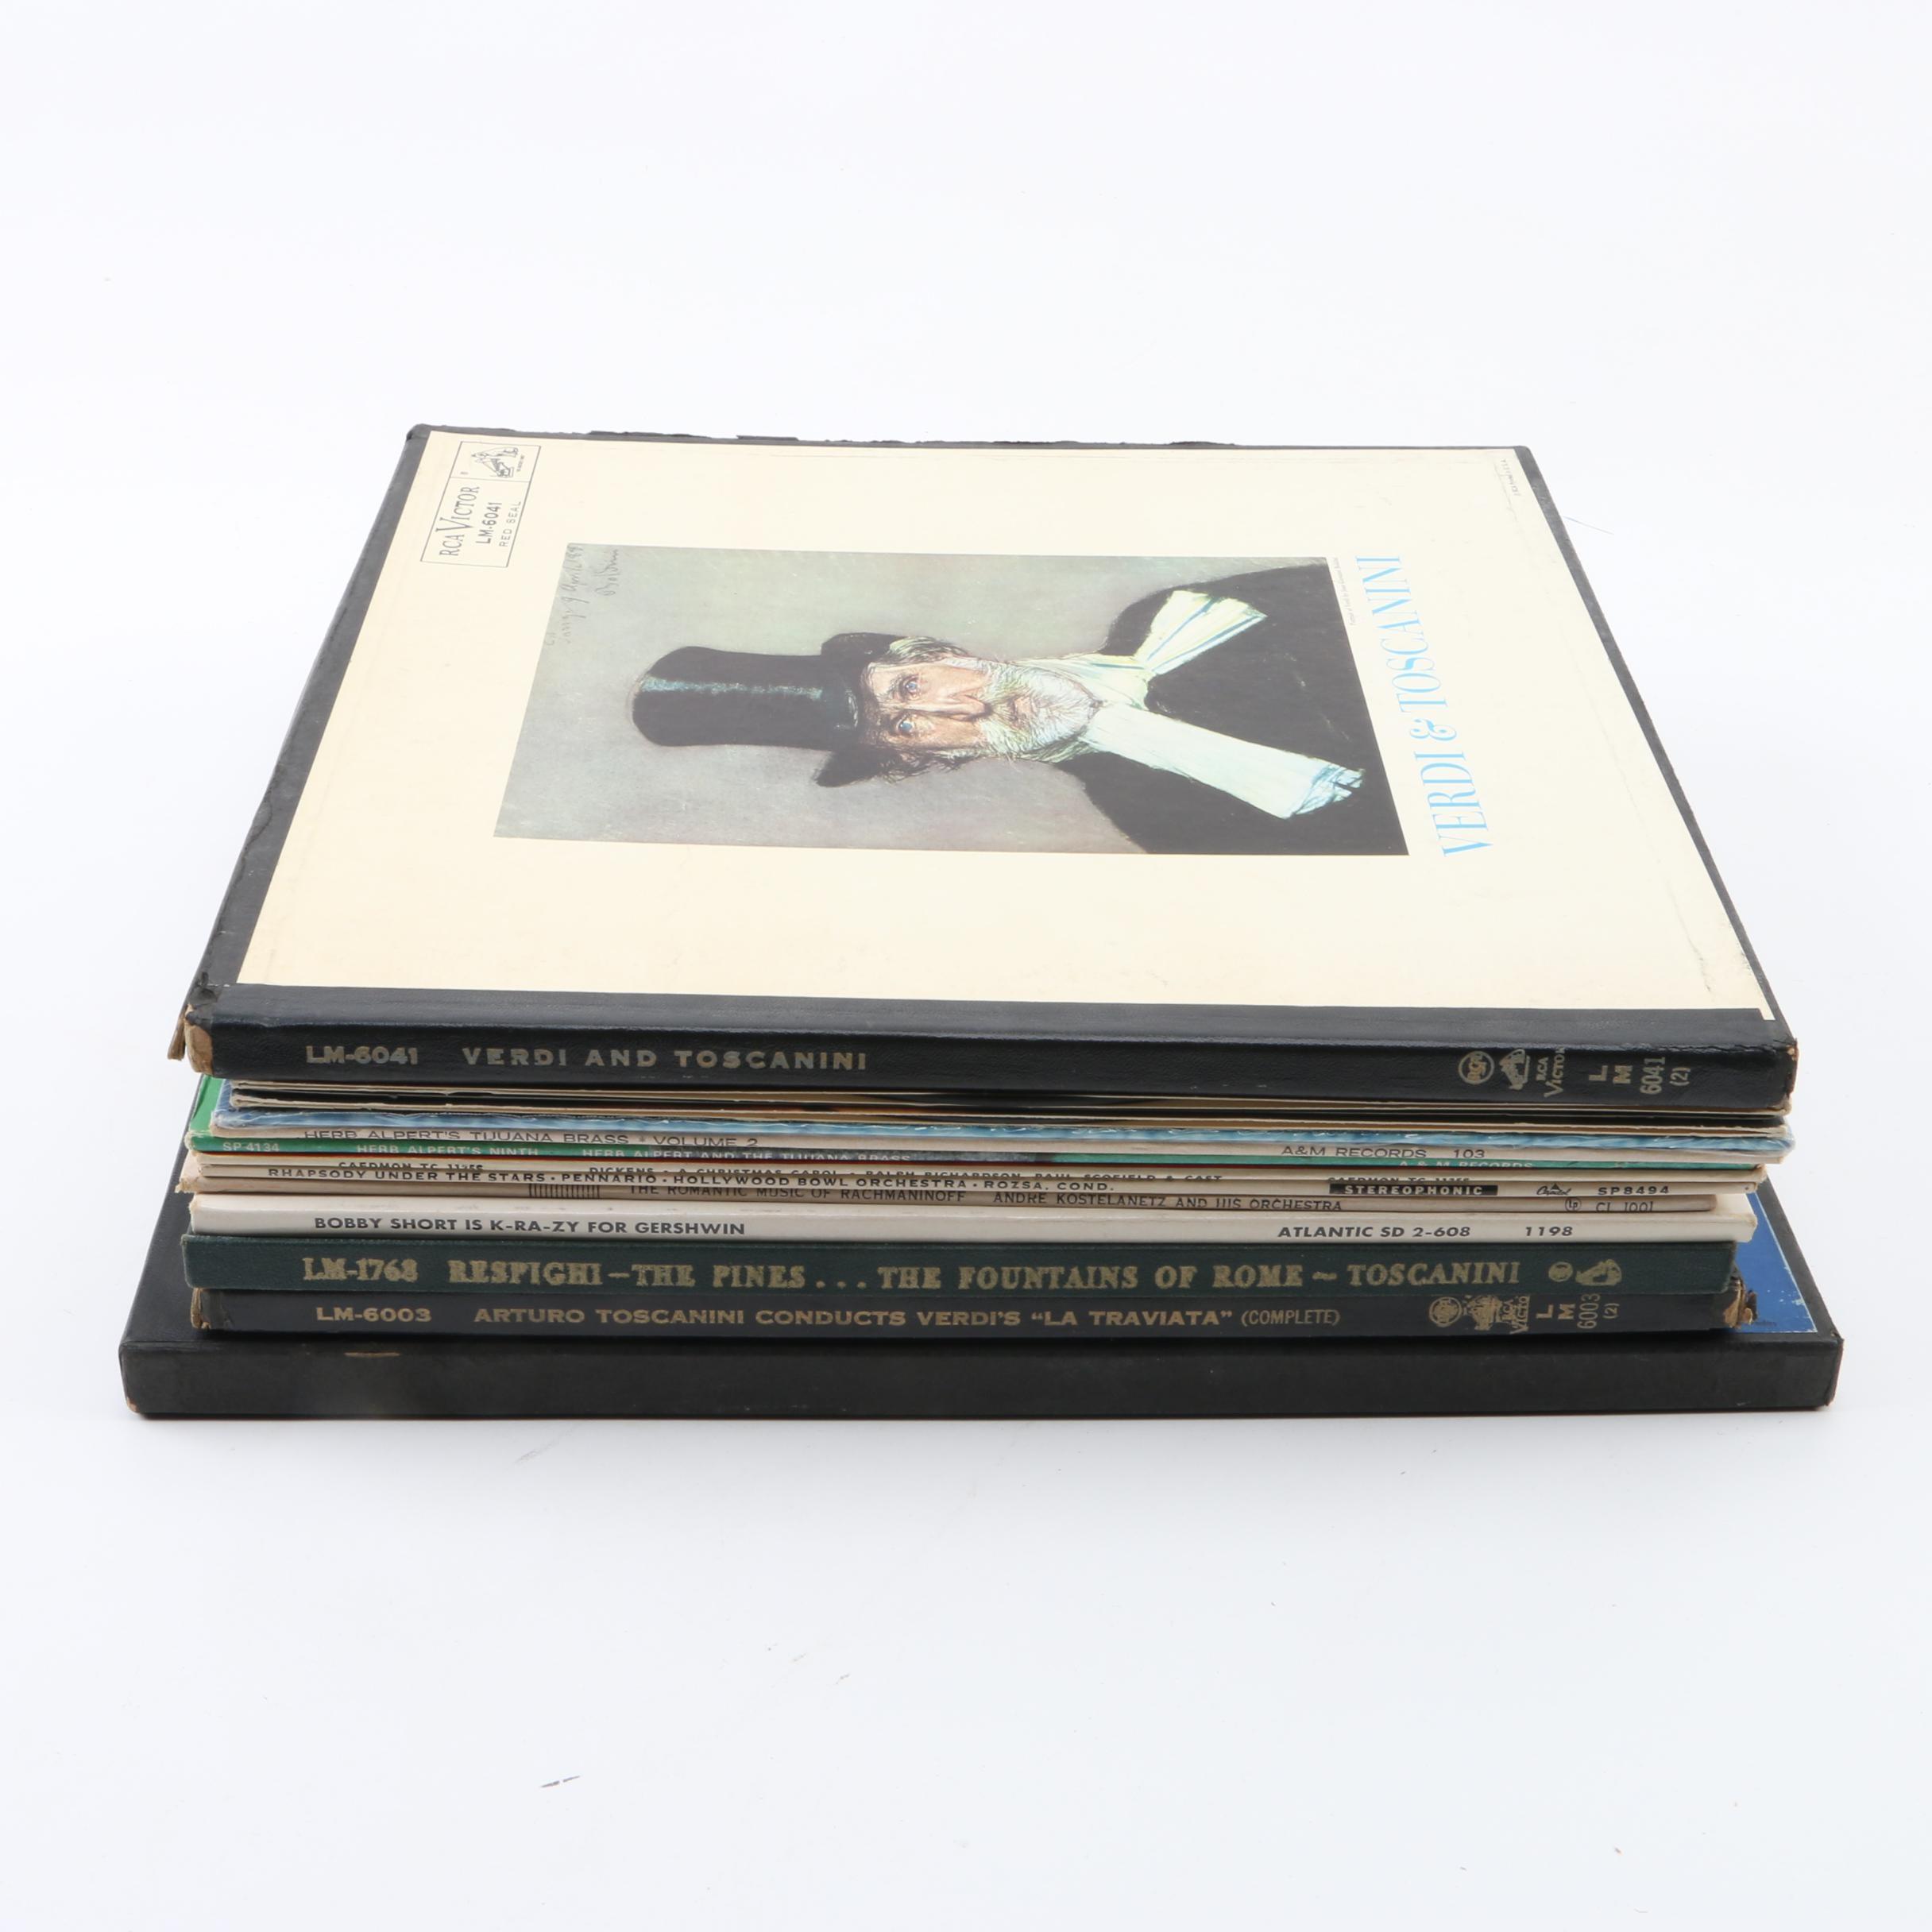 Vinyl Jazz and Classical Records Including Verdi, Toscanini, Gershwin, Alpert